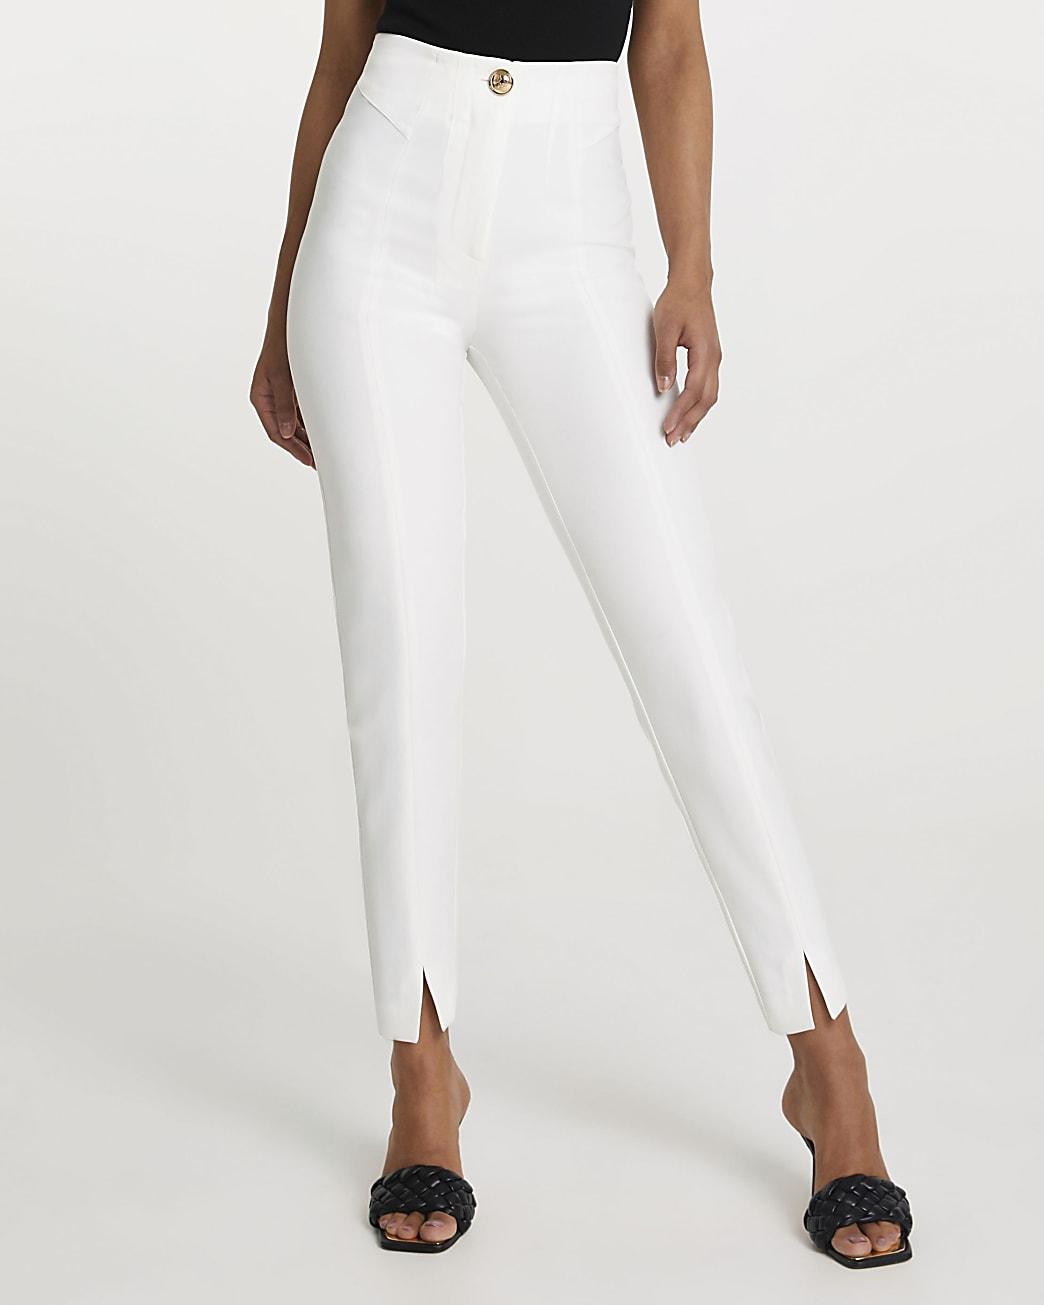 White split front cigarette trousers